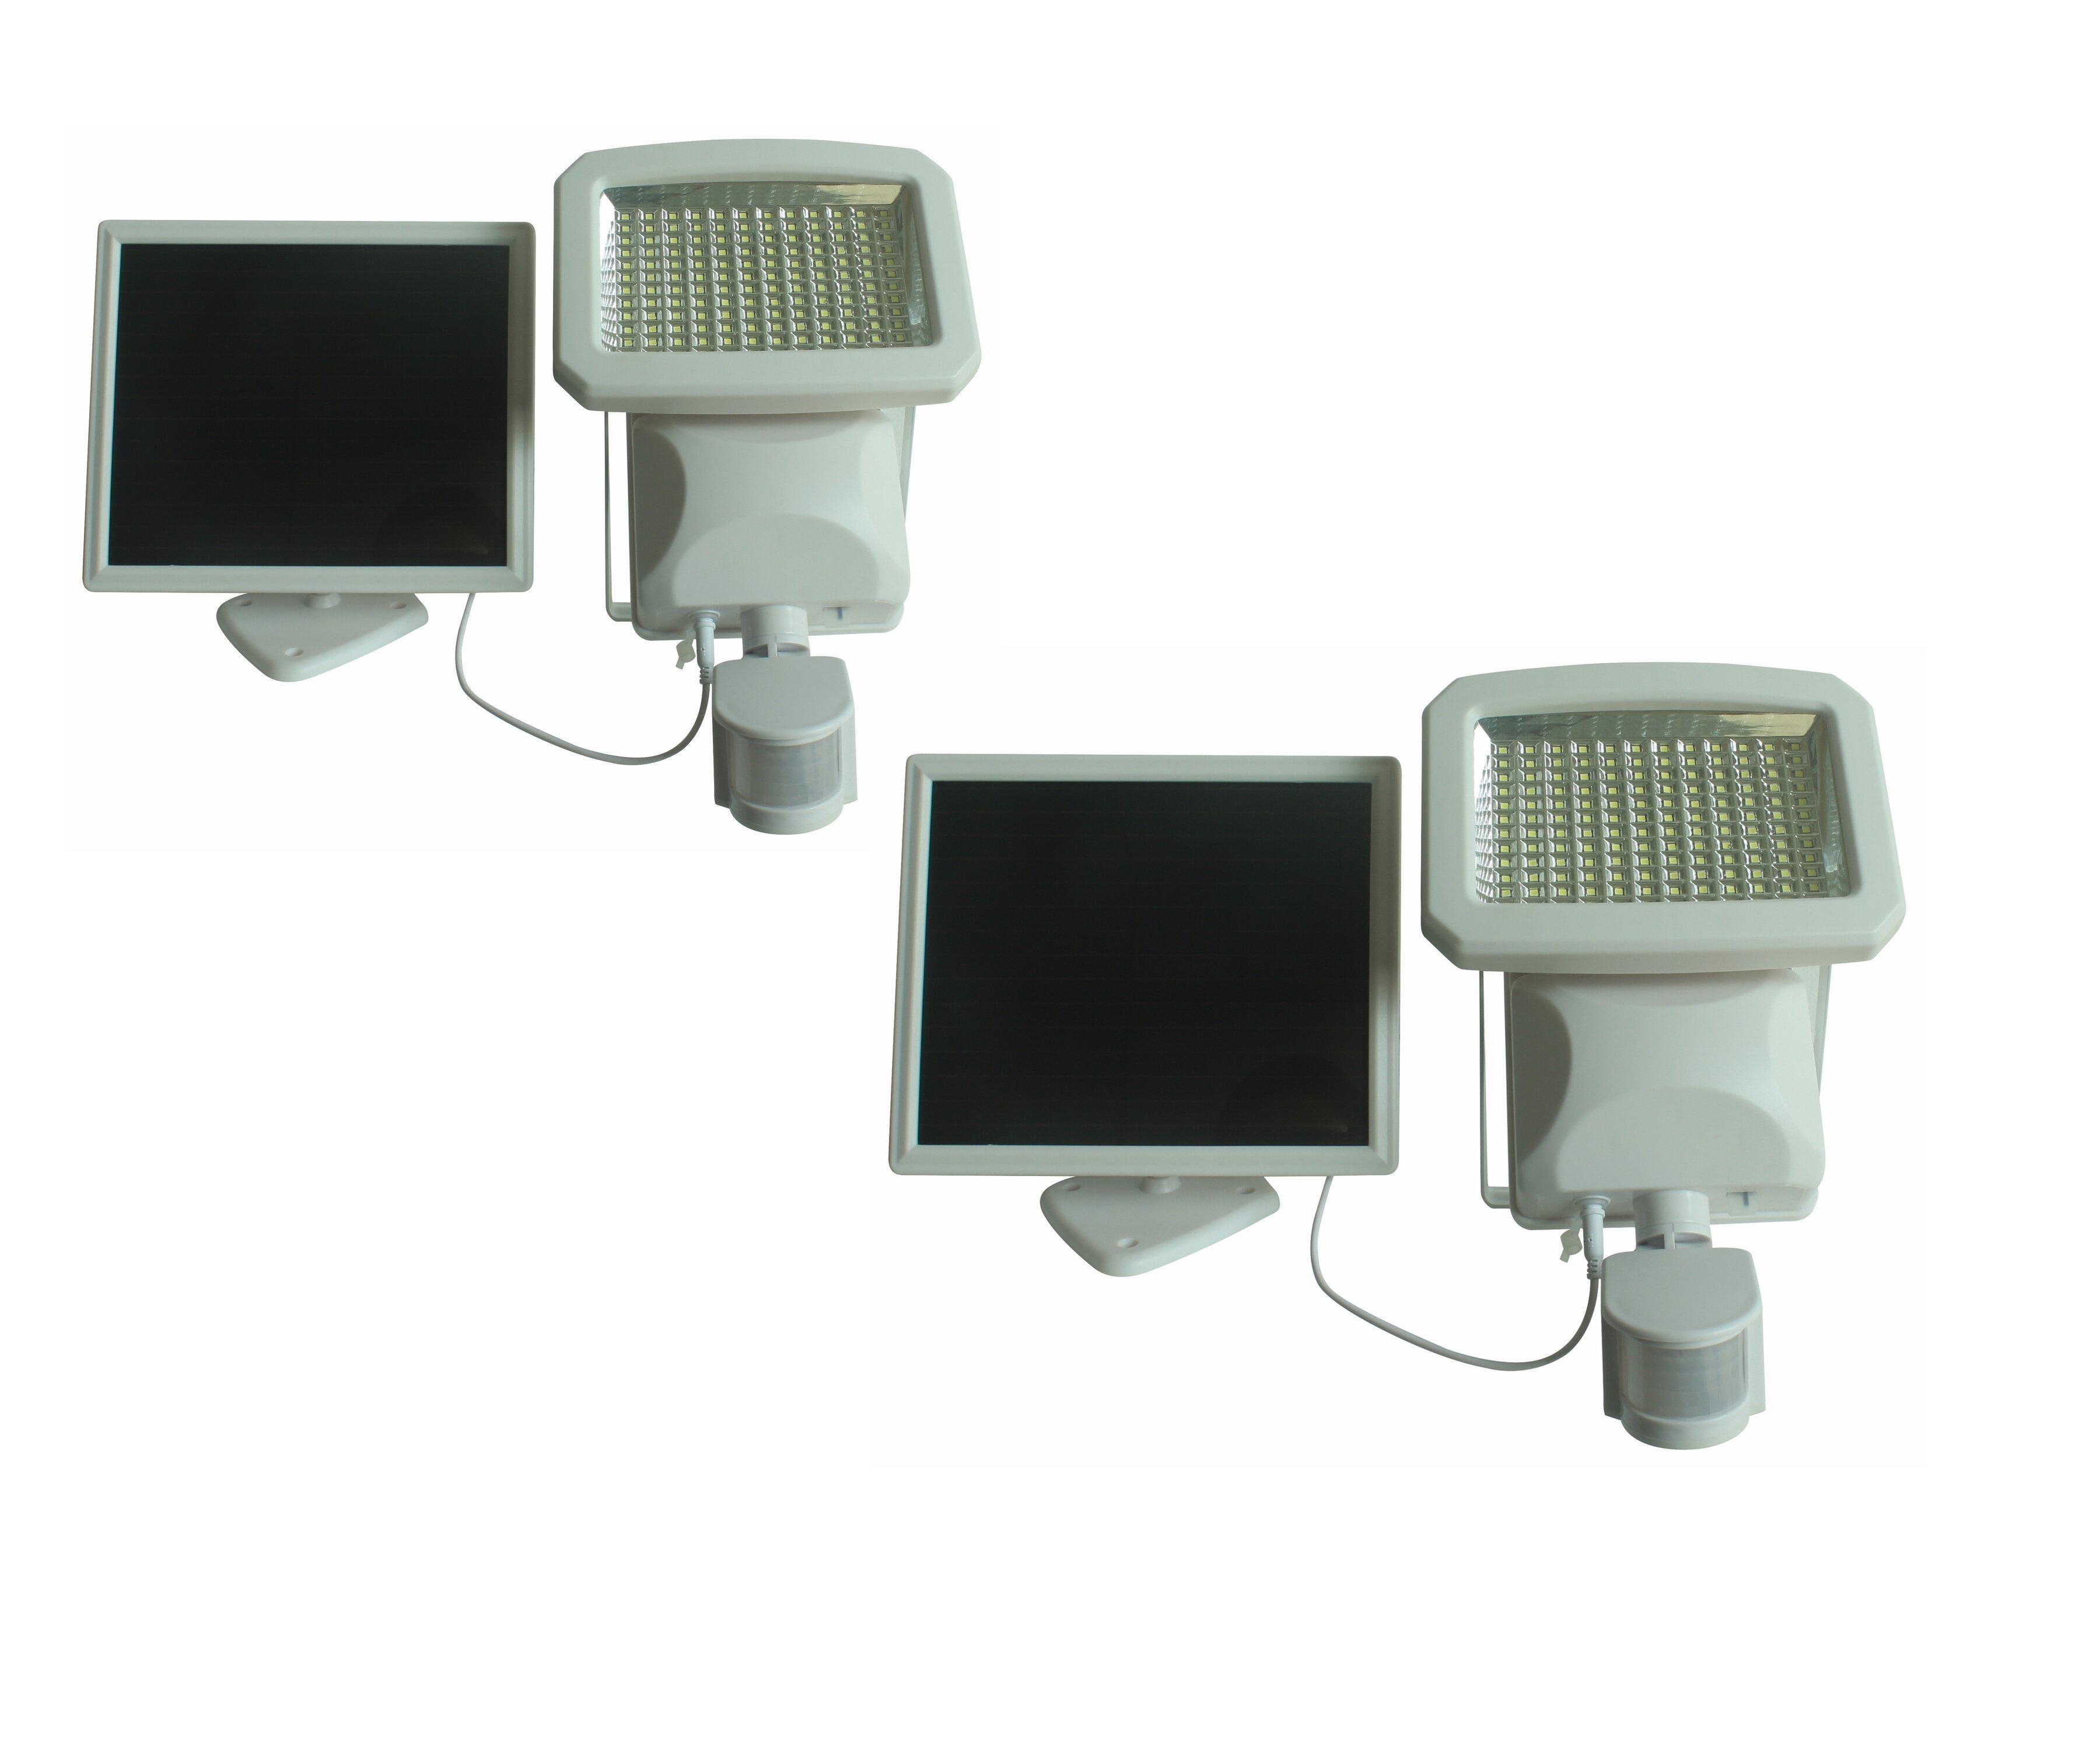 Nature Power 1 5 Watt Led Solar Power Dusk To Dawn Outdoor Security Flood Light With Motion Sensor Pack Of 2 Wayfair